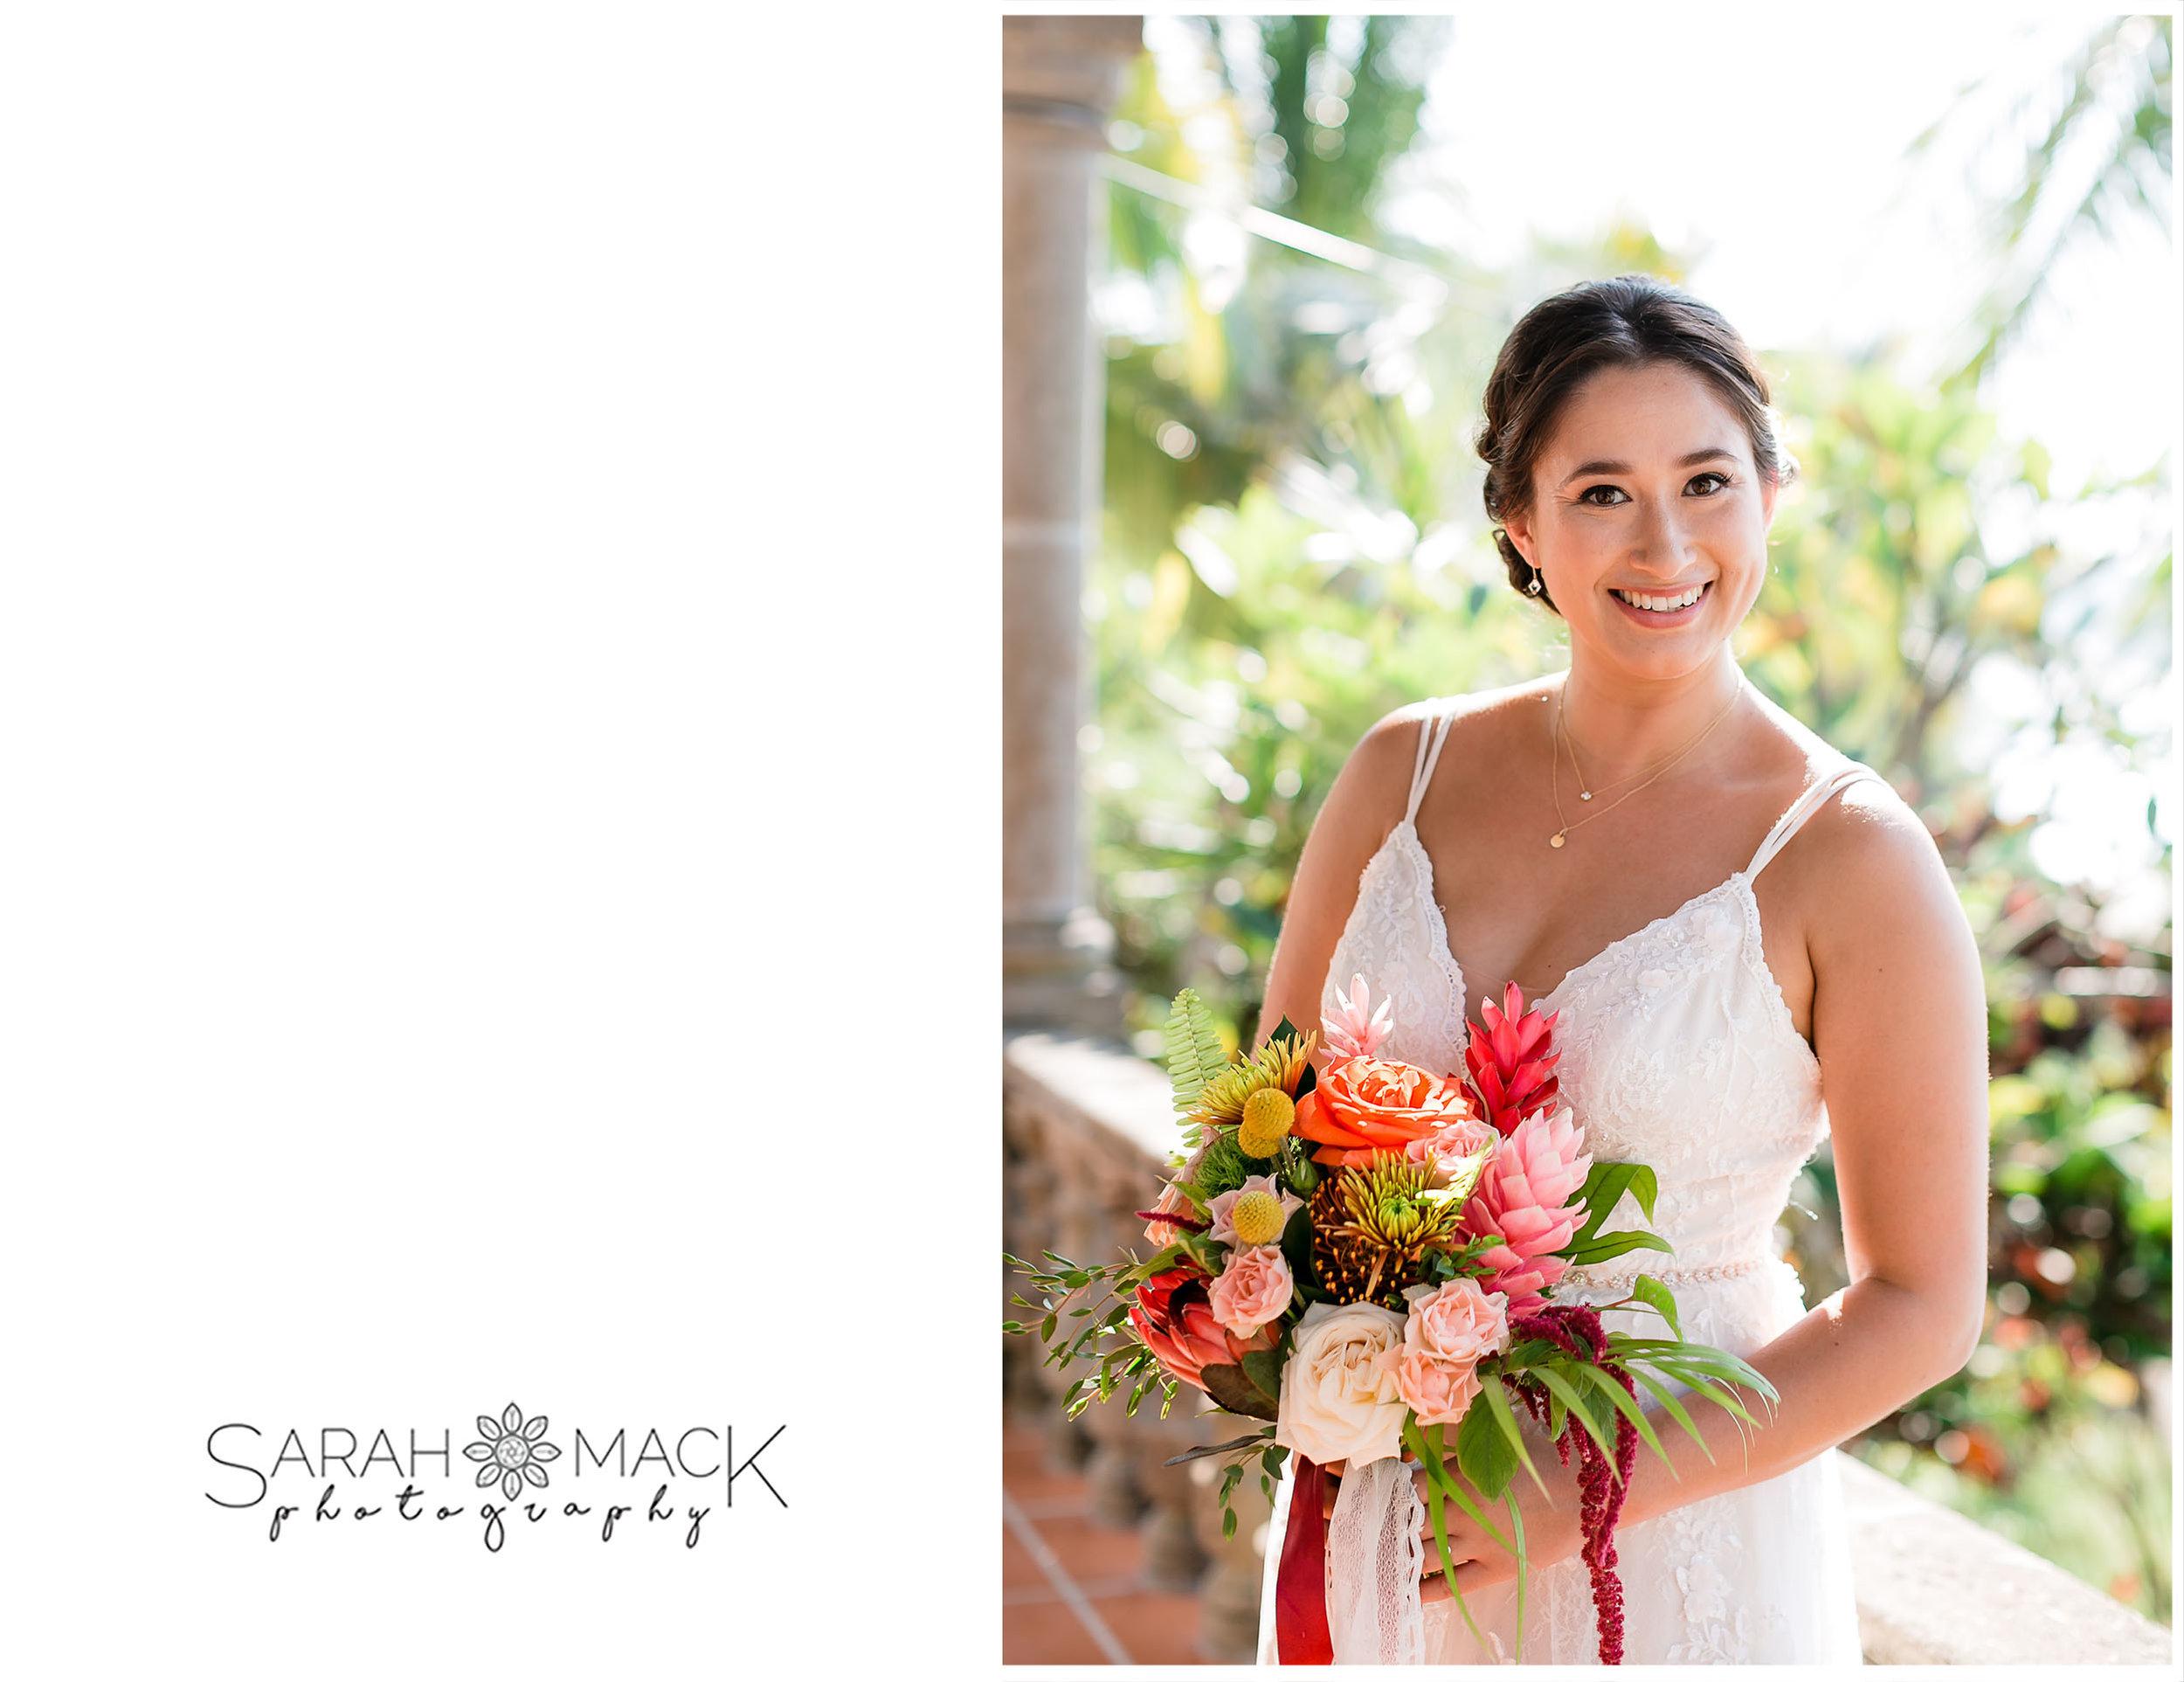 ES-Flor-de-Playa-Sayulita-Wedding-Photography-15.jpg